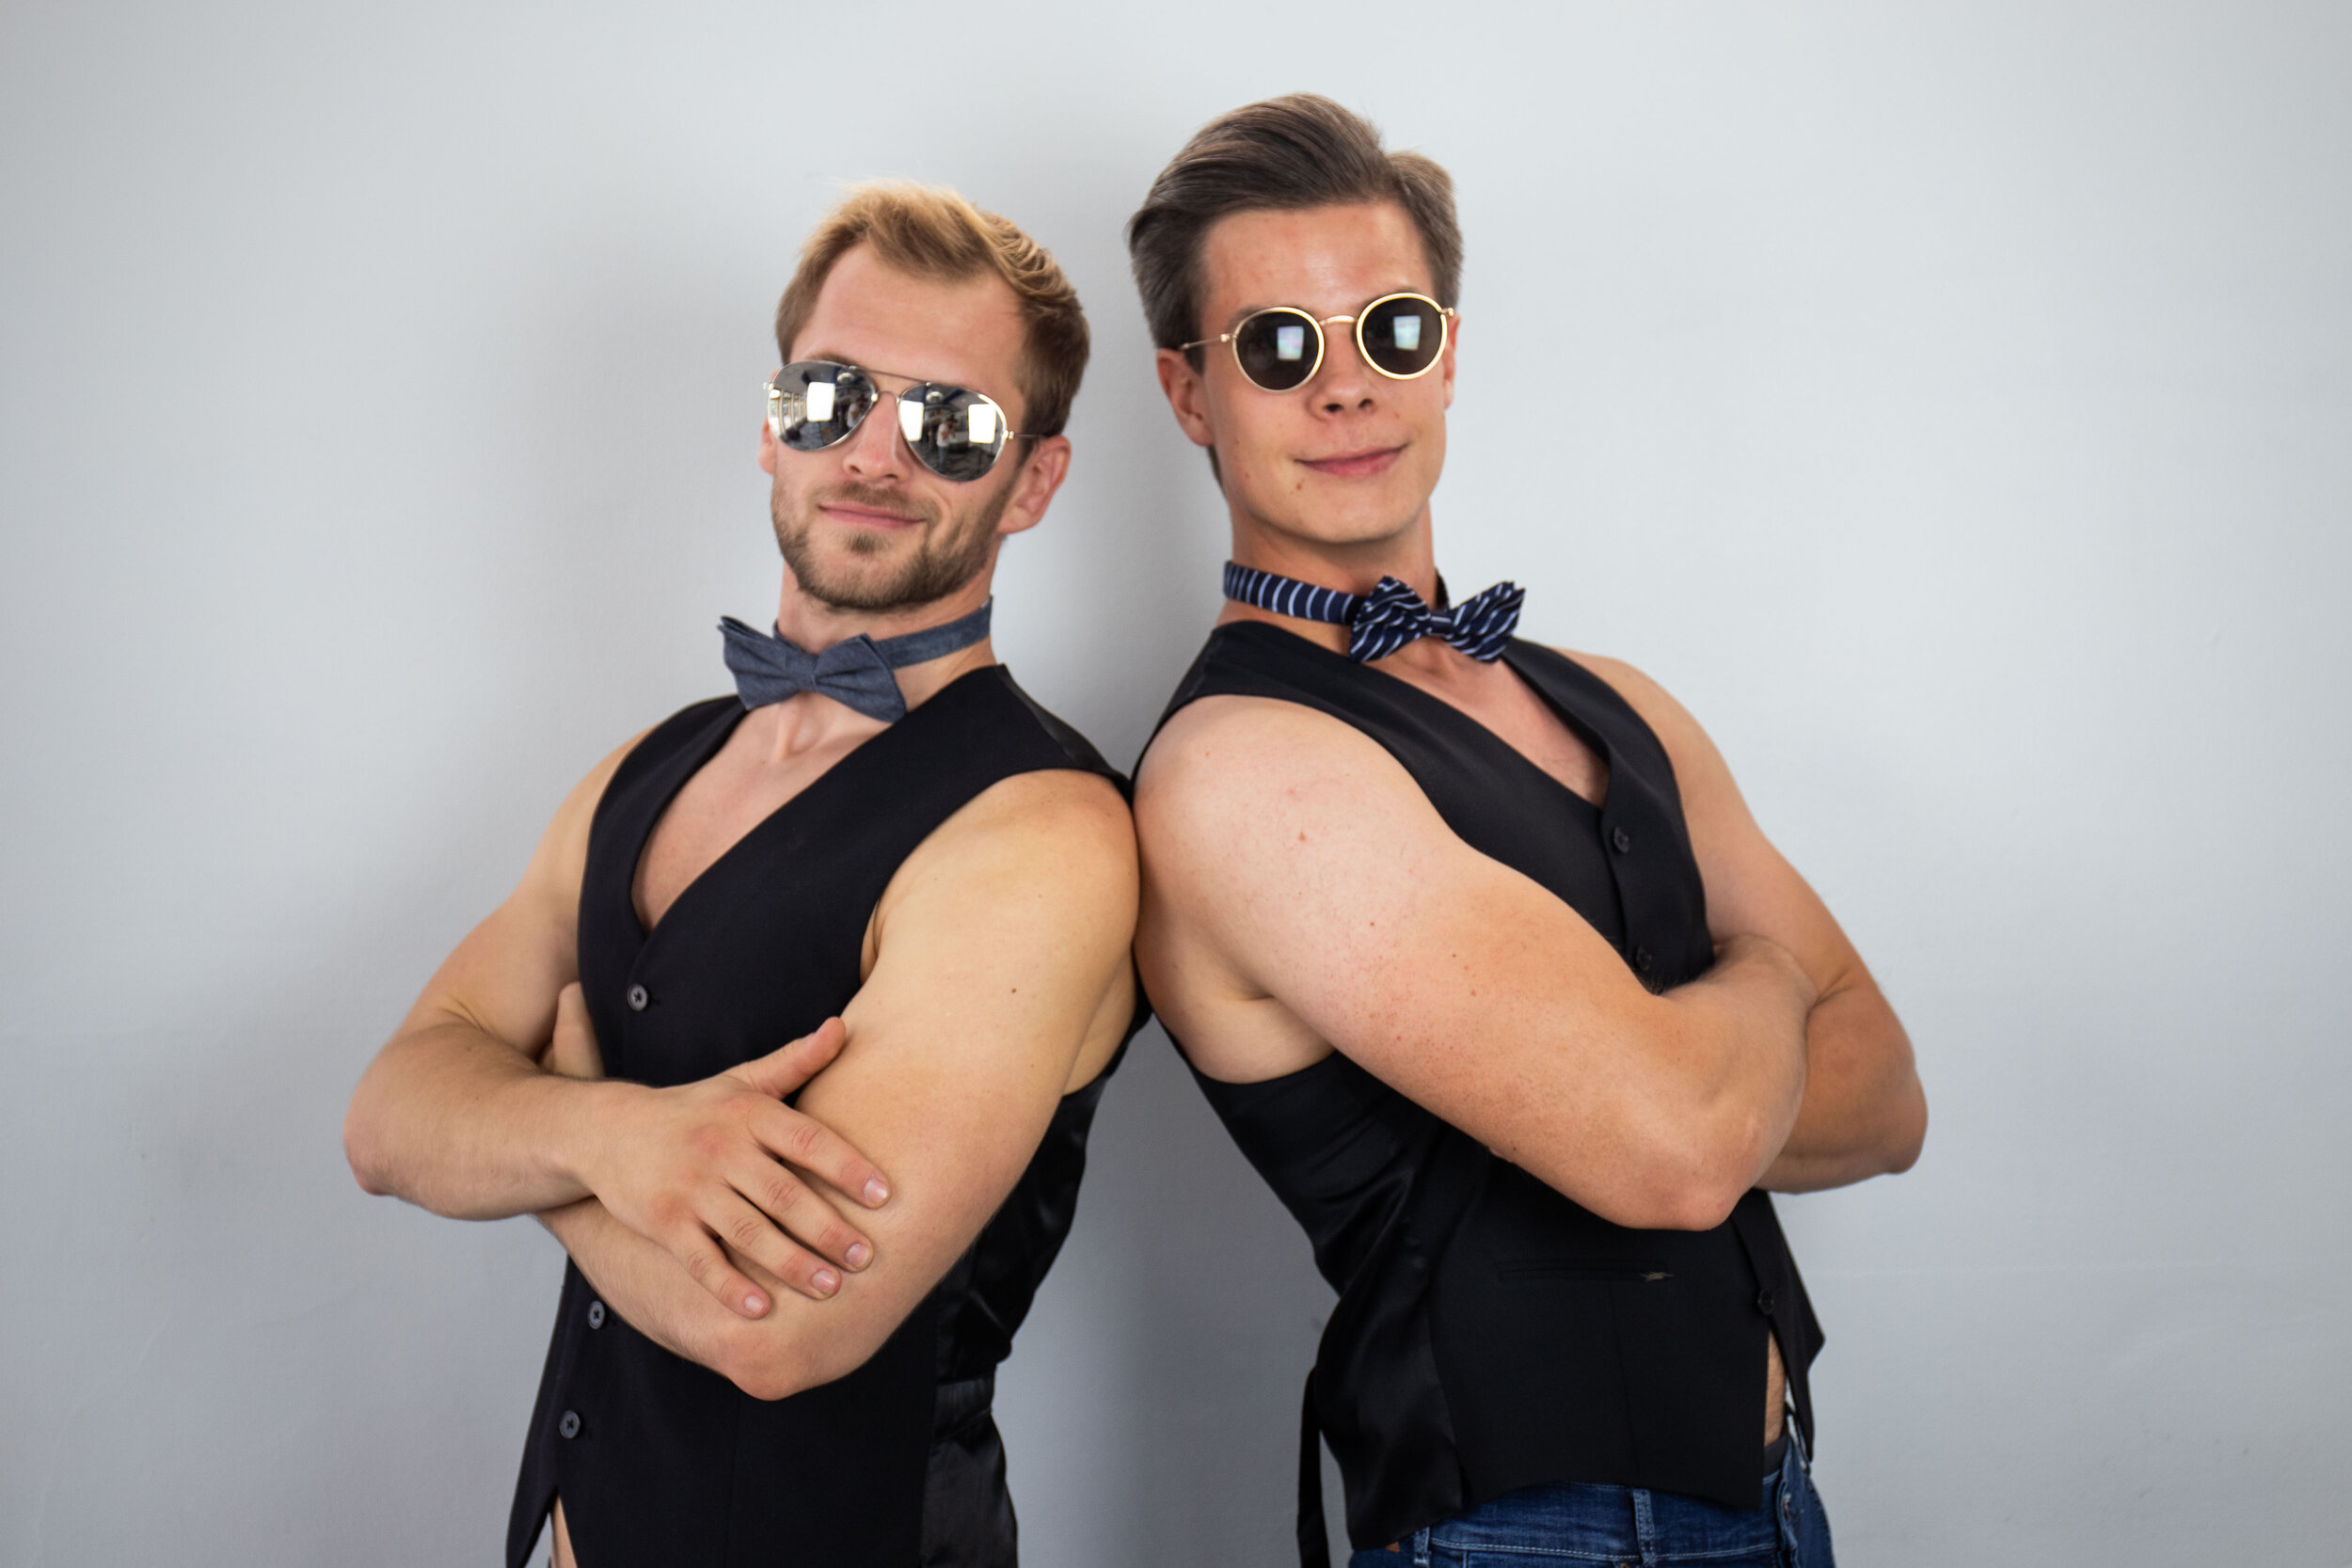 Eric Kranz och Nicolas Pershaf, Sexmästare.